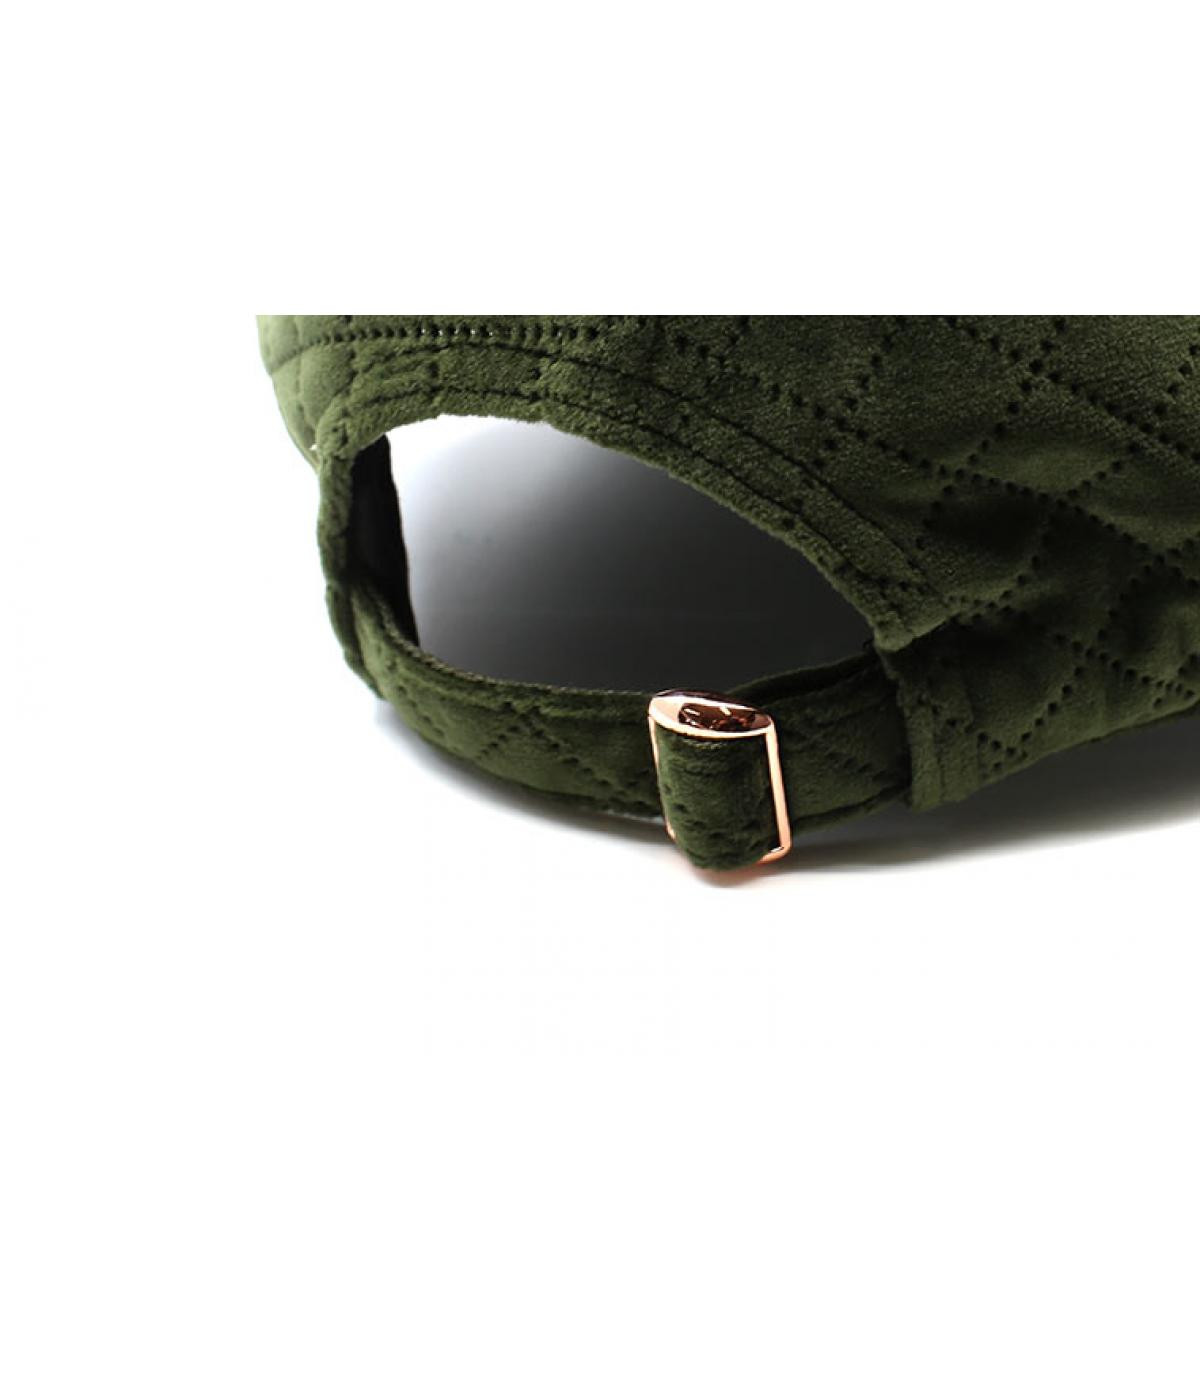 Details Cap Wmns Winter Pack LA 9Forty olive - Abbildung 5